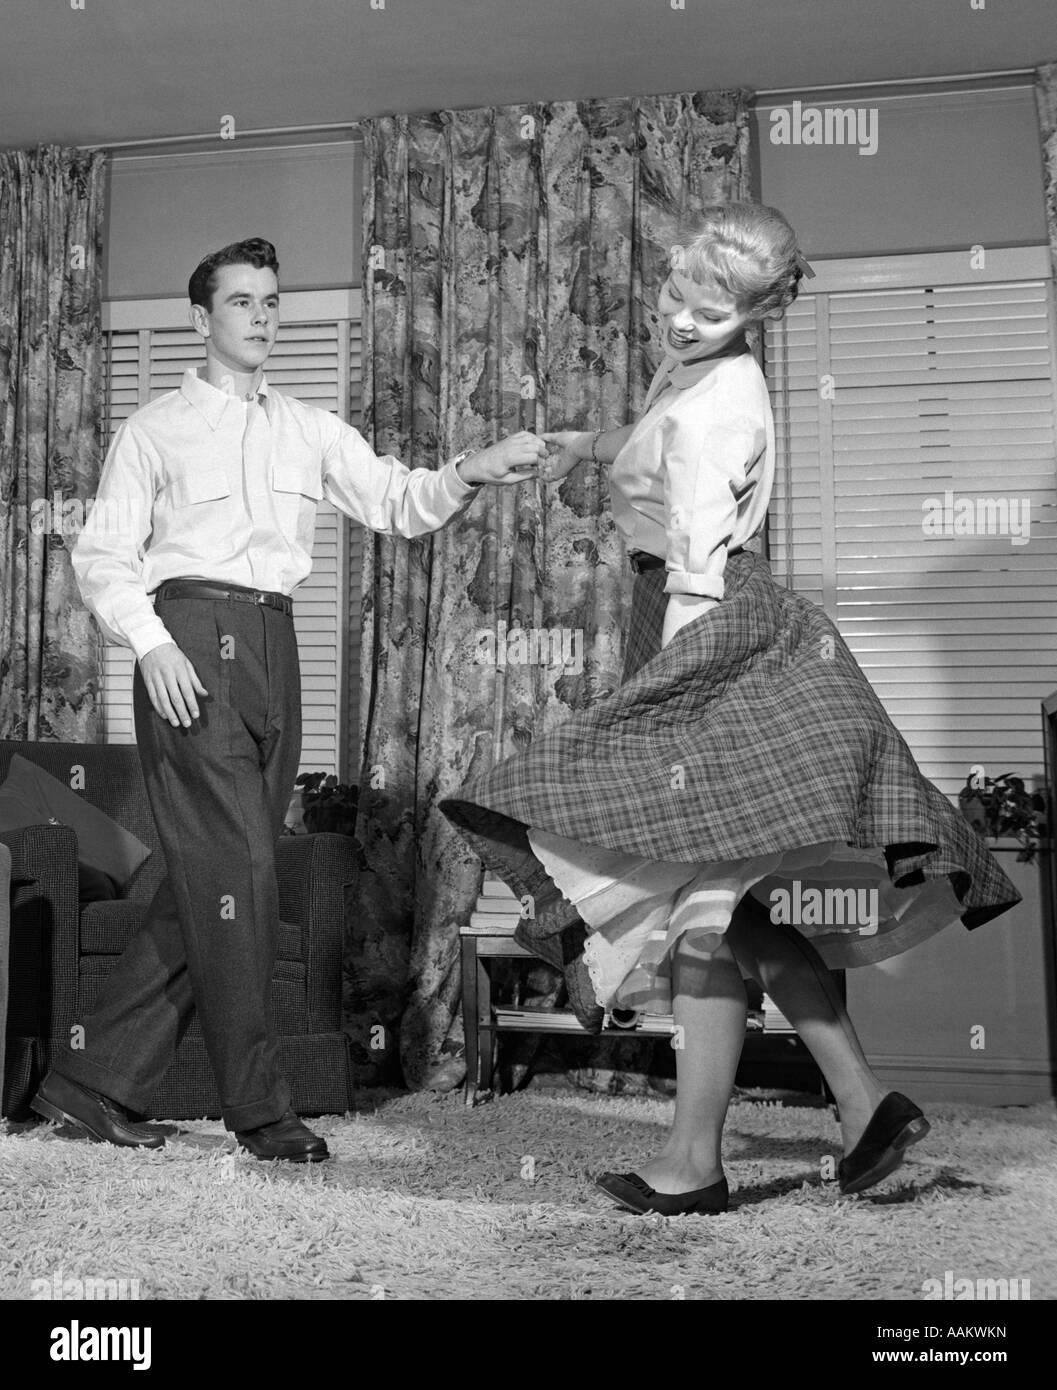 1950s TEENAGE COUPLE JITTERBUG DANCING TOGETHER IN LIVING ROOM - Stock Image